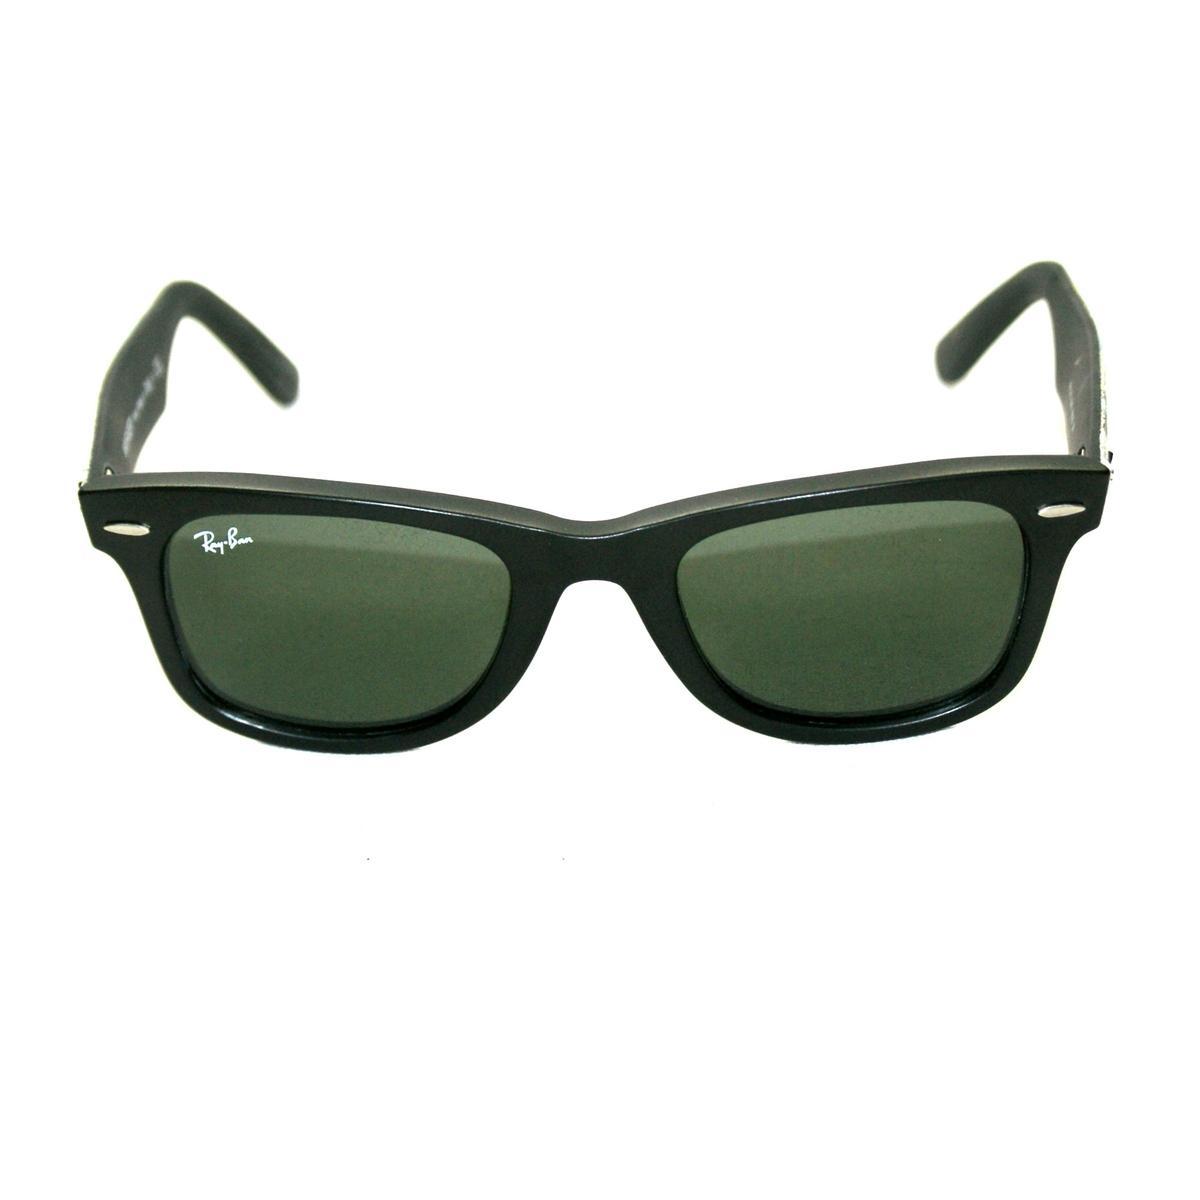 Ray Ban Ray Ban Original Wayfarer Sunglasses Camouflage ...